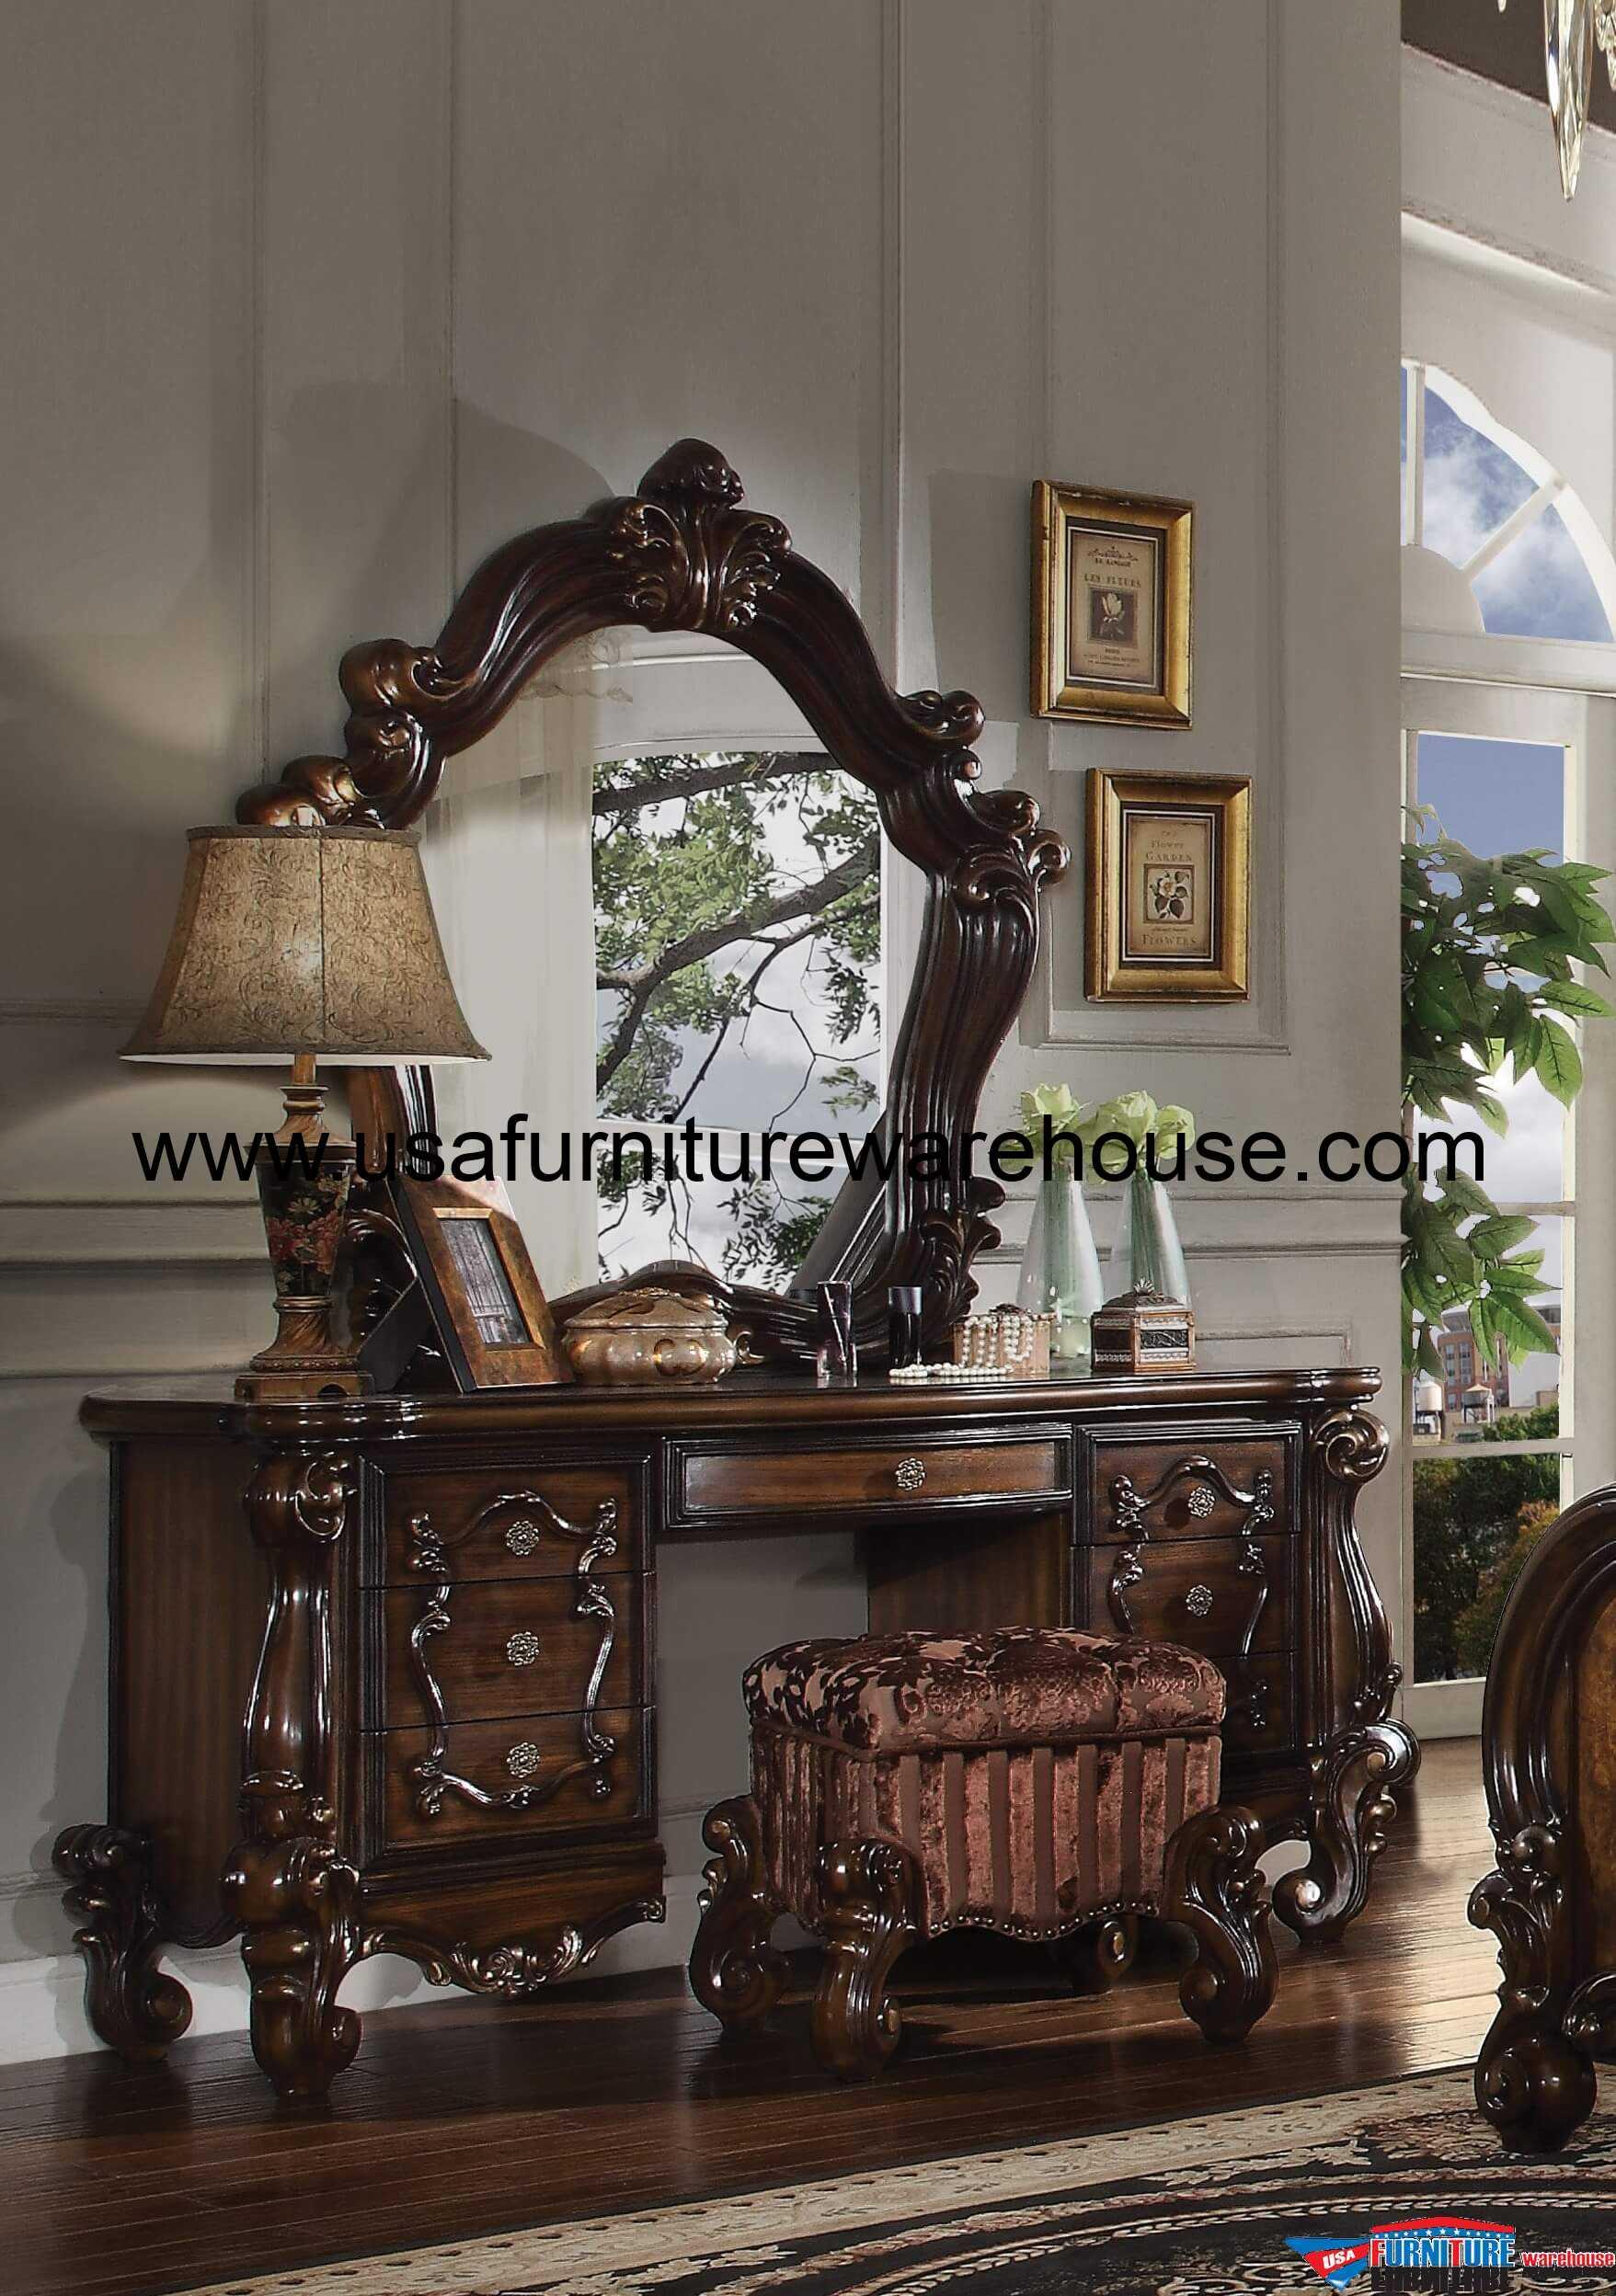 3 Piece Acme Versailles Vanity Mirror With Stool Cherry